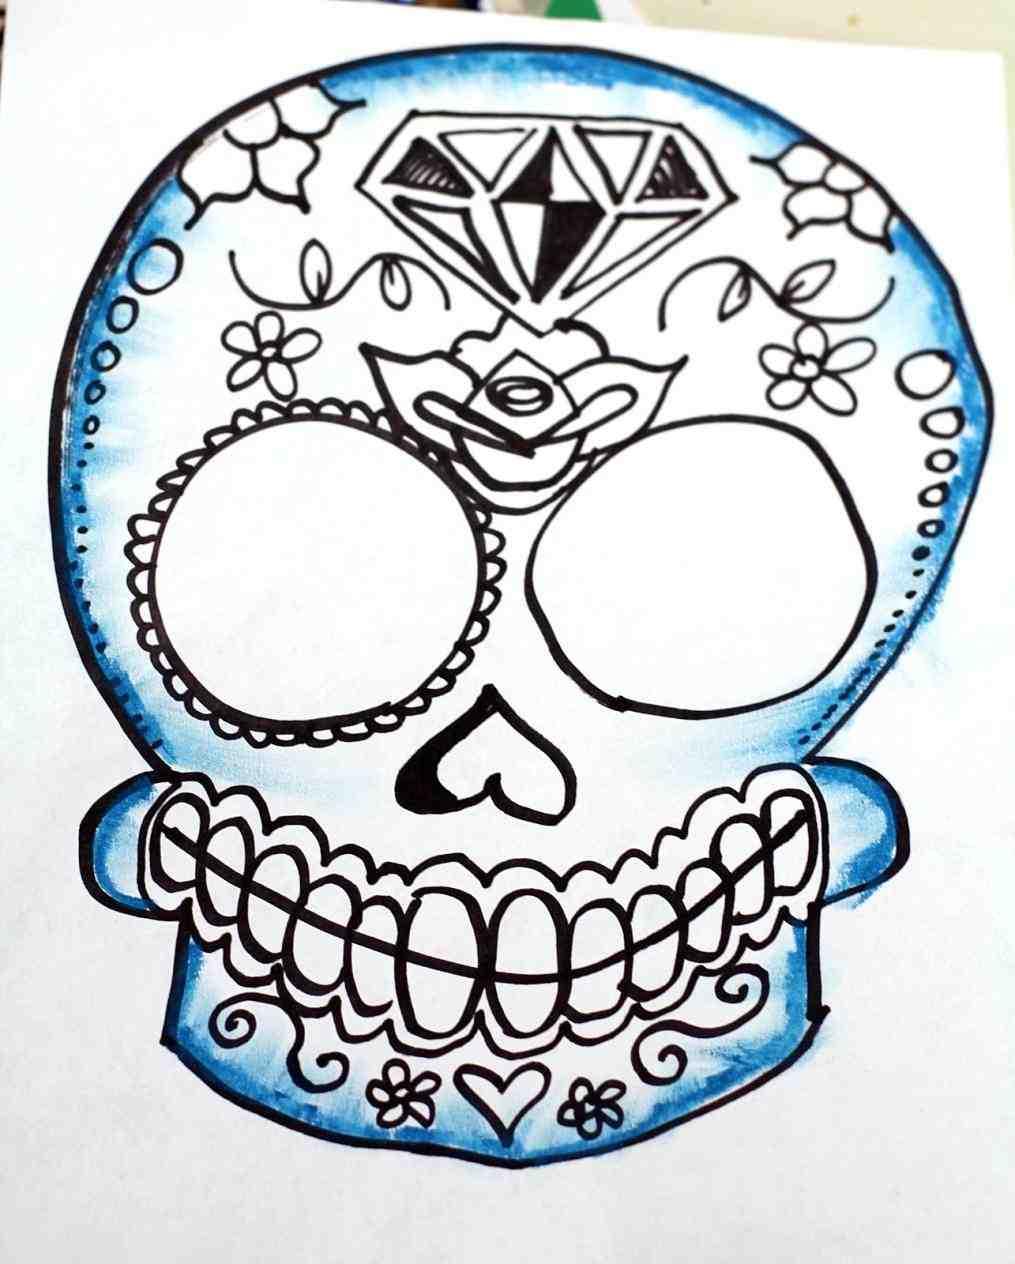 1015x1264 Cool Easy Drawings Of Skulls